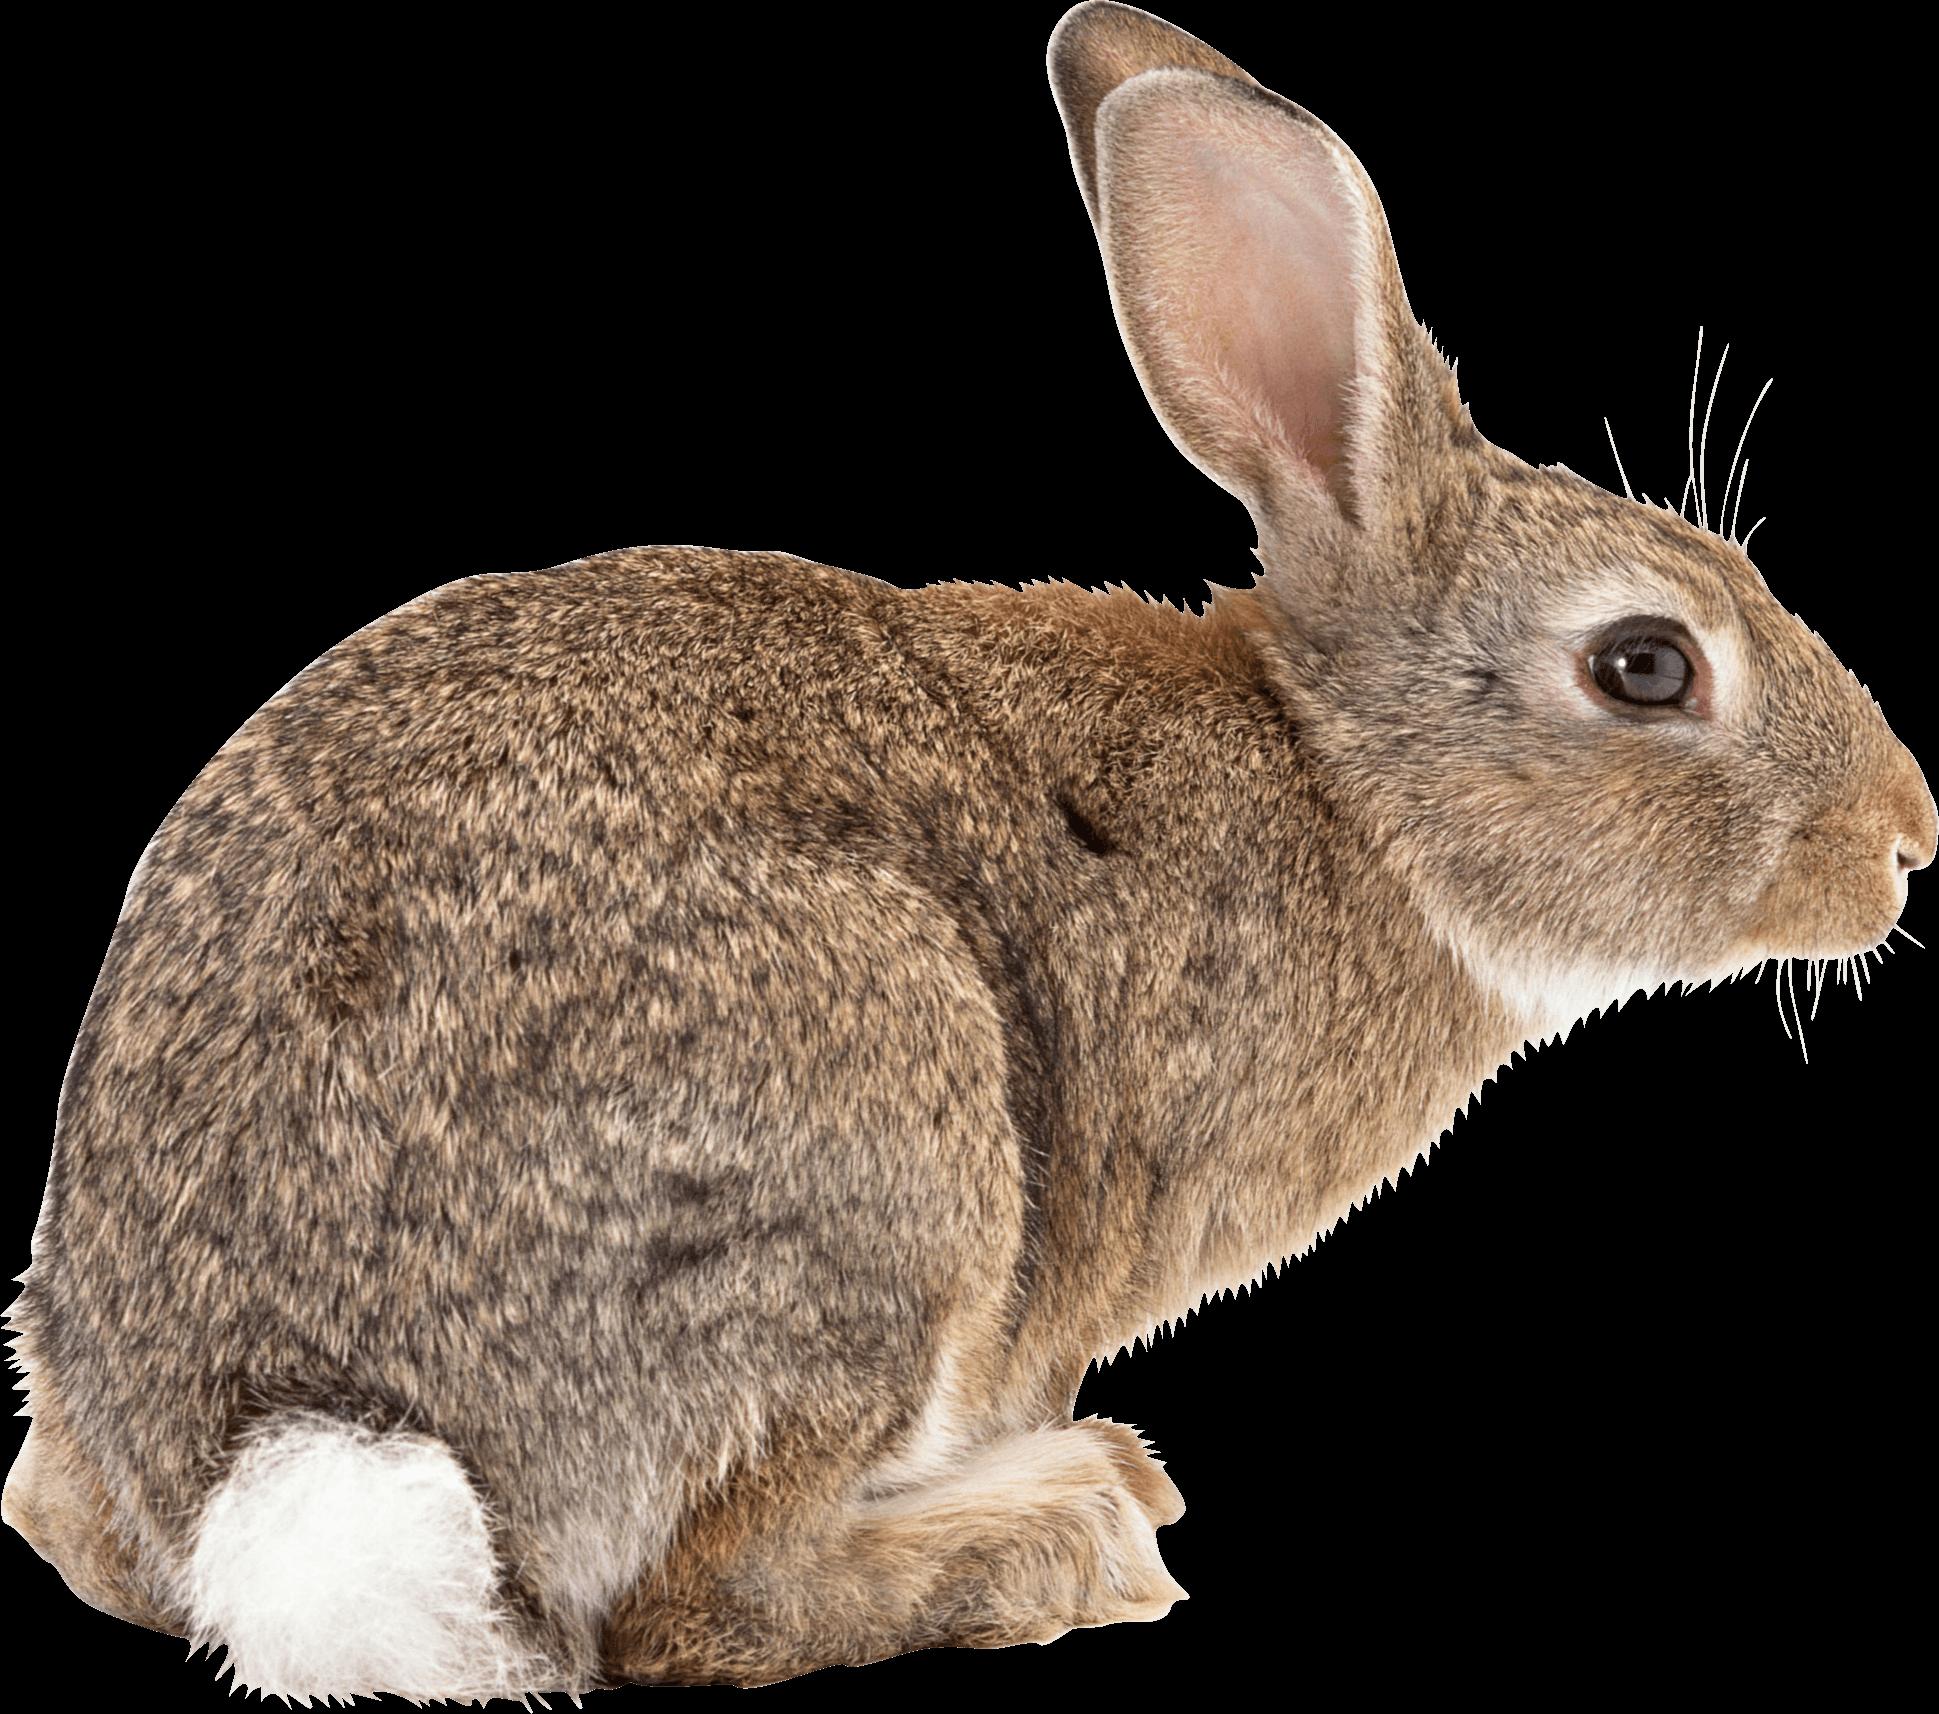 Rabbit Ready To Jump - Rabbit HD PNG